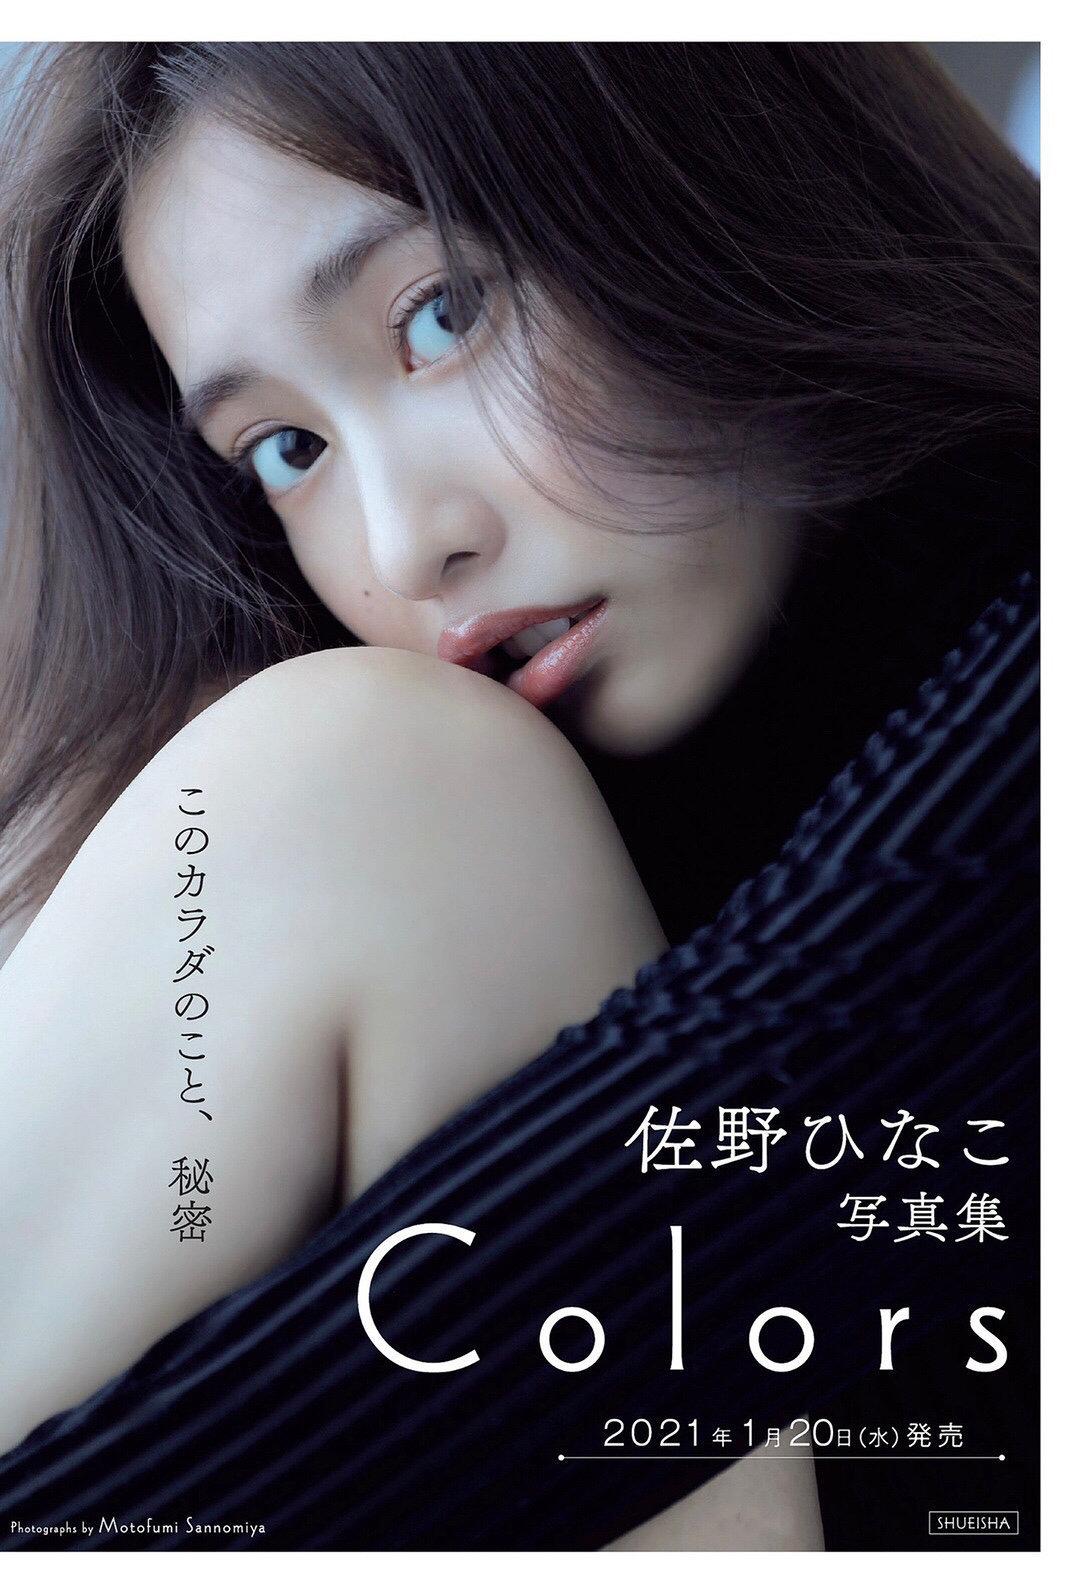 佐野雏子2021年写真集《colors》-itotii